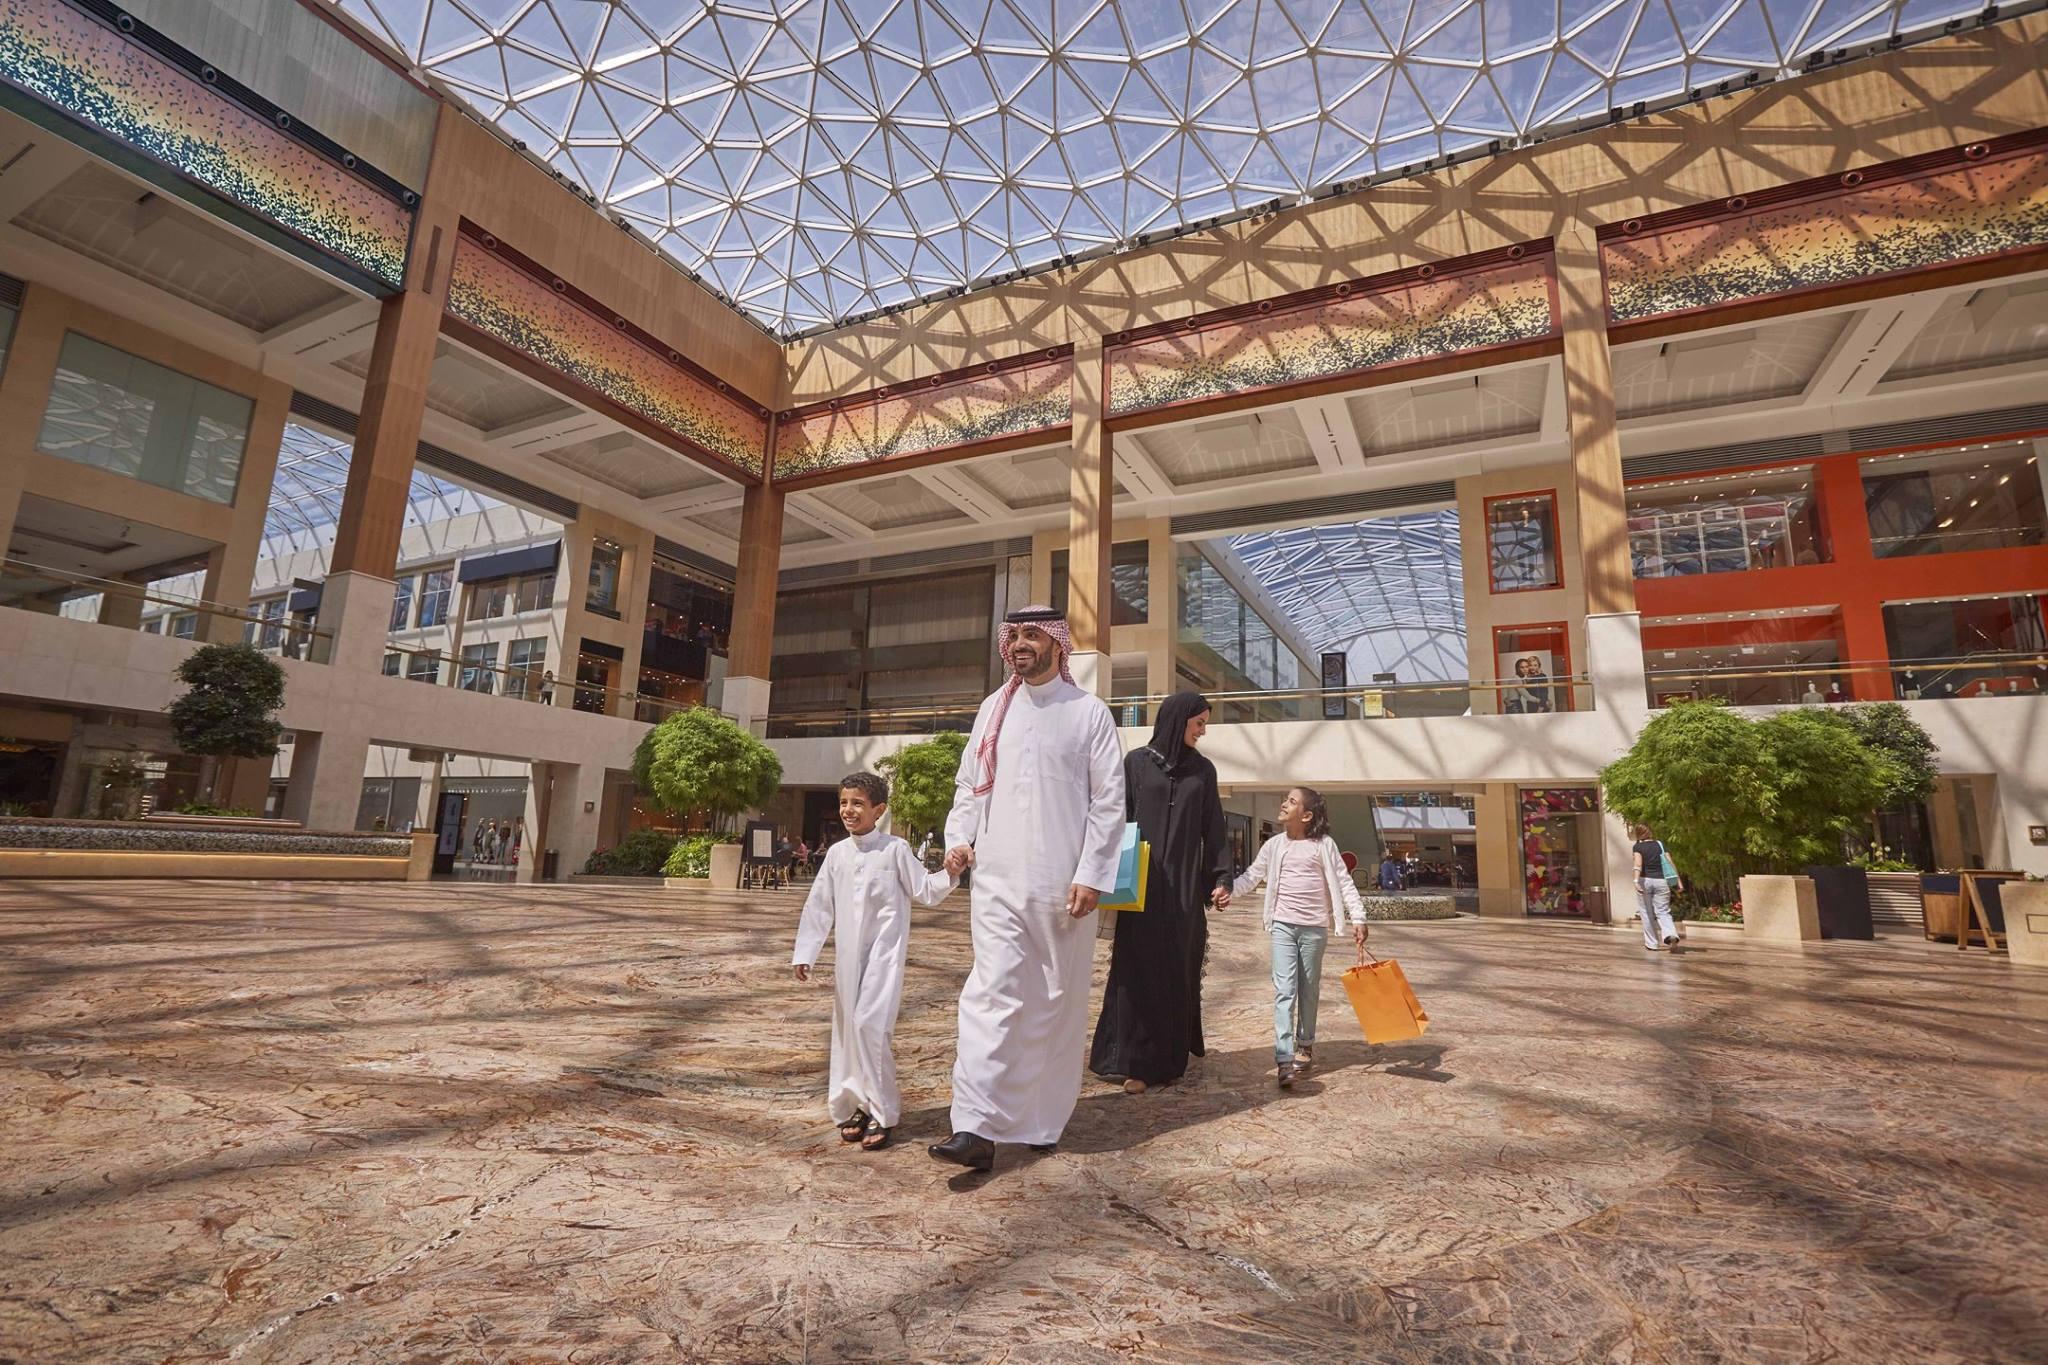 Abu Dhabi malls and shopping